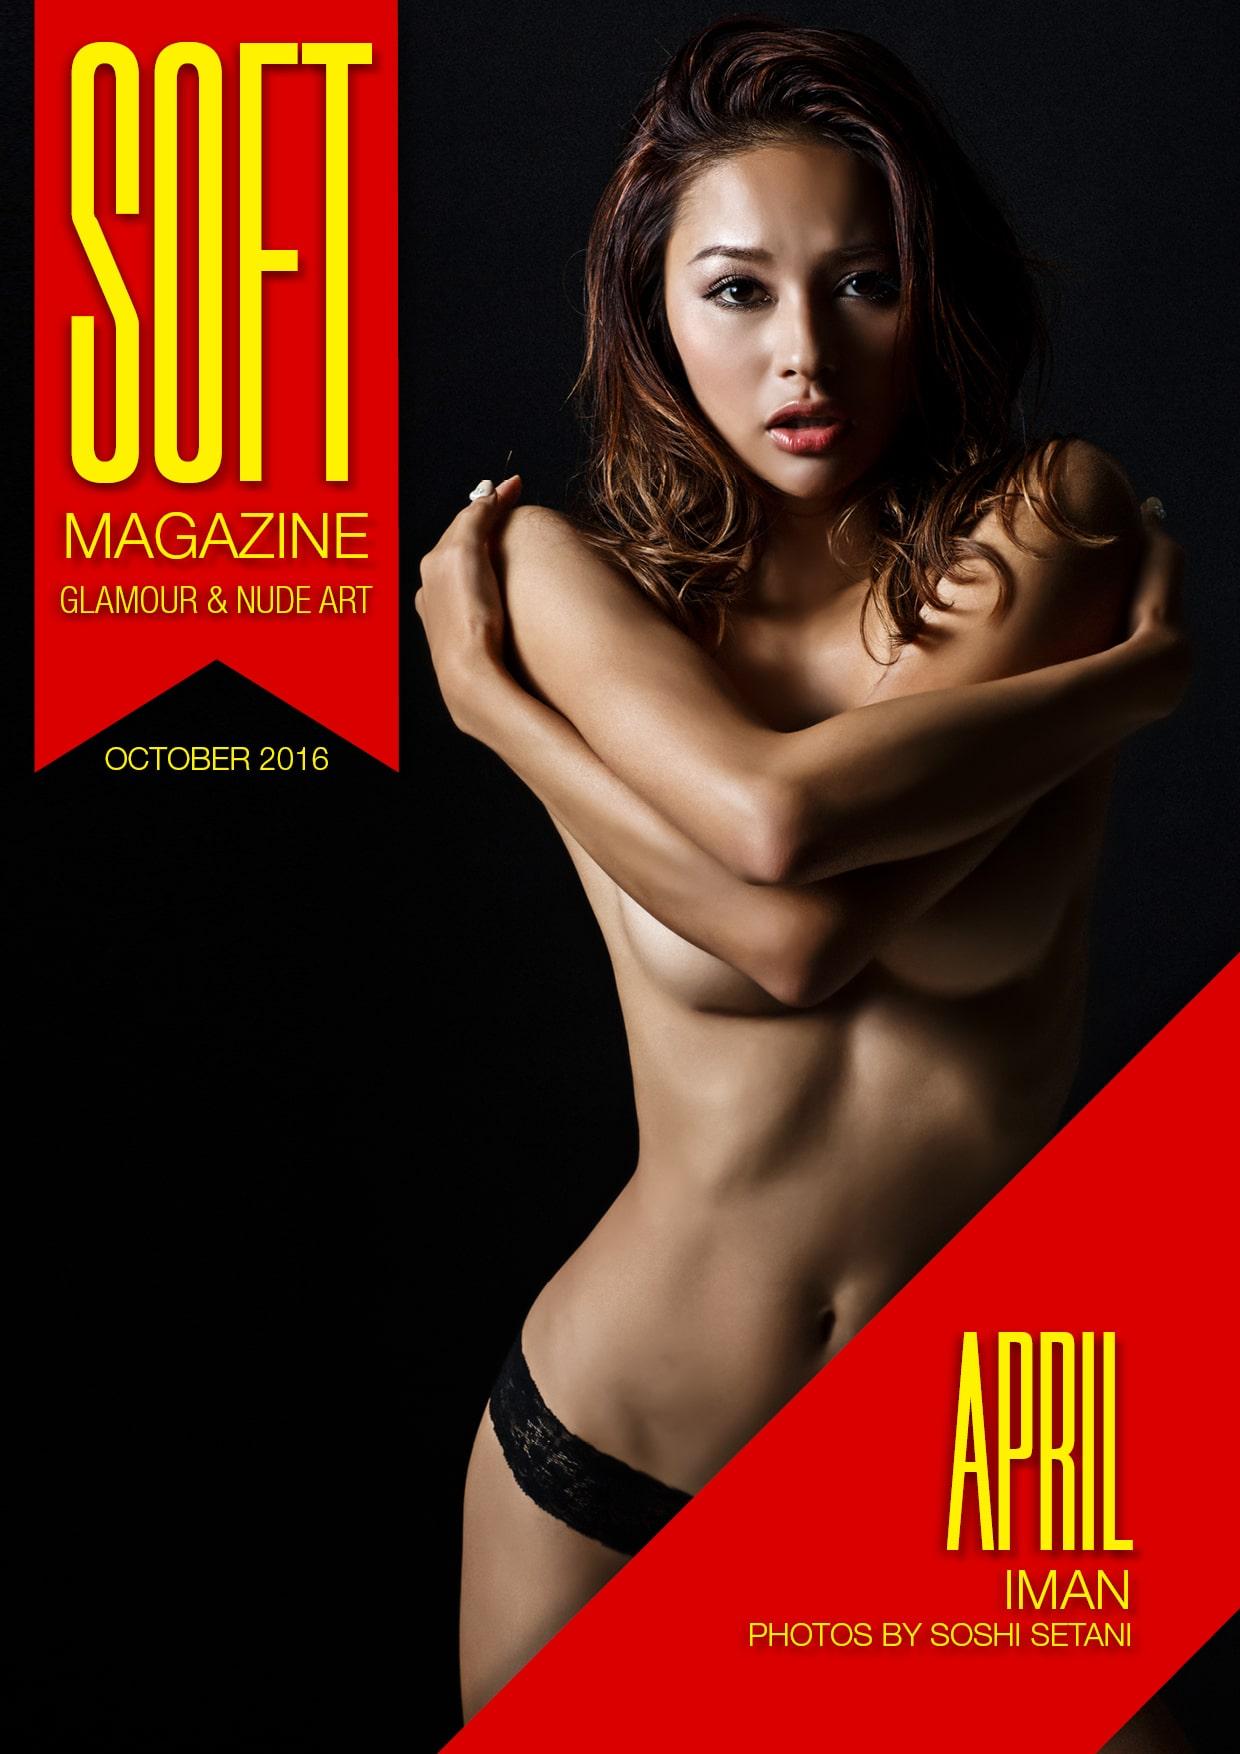 Soft Magazine - October 2016 - April Iman